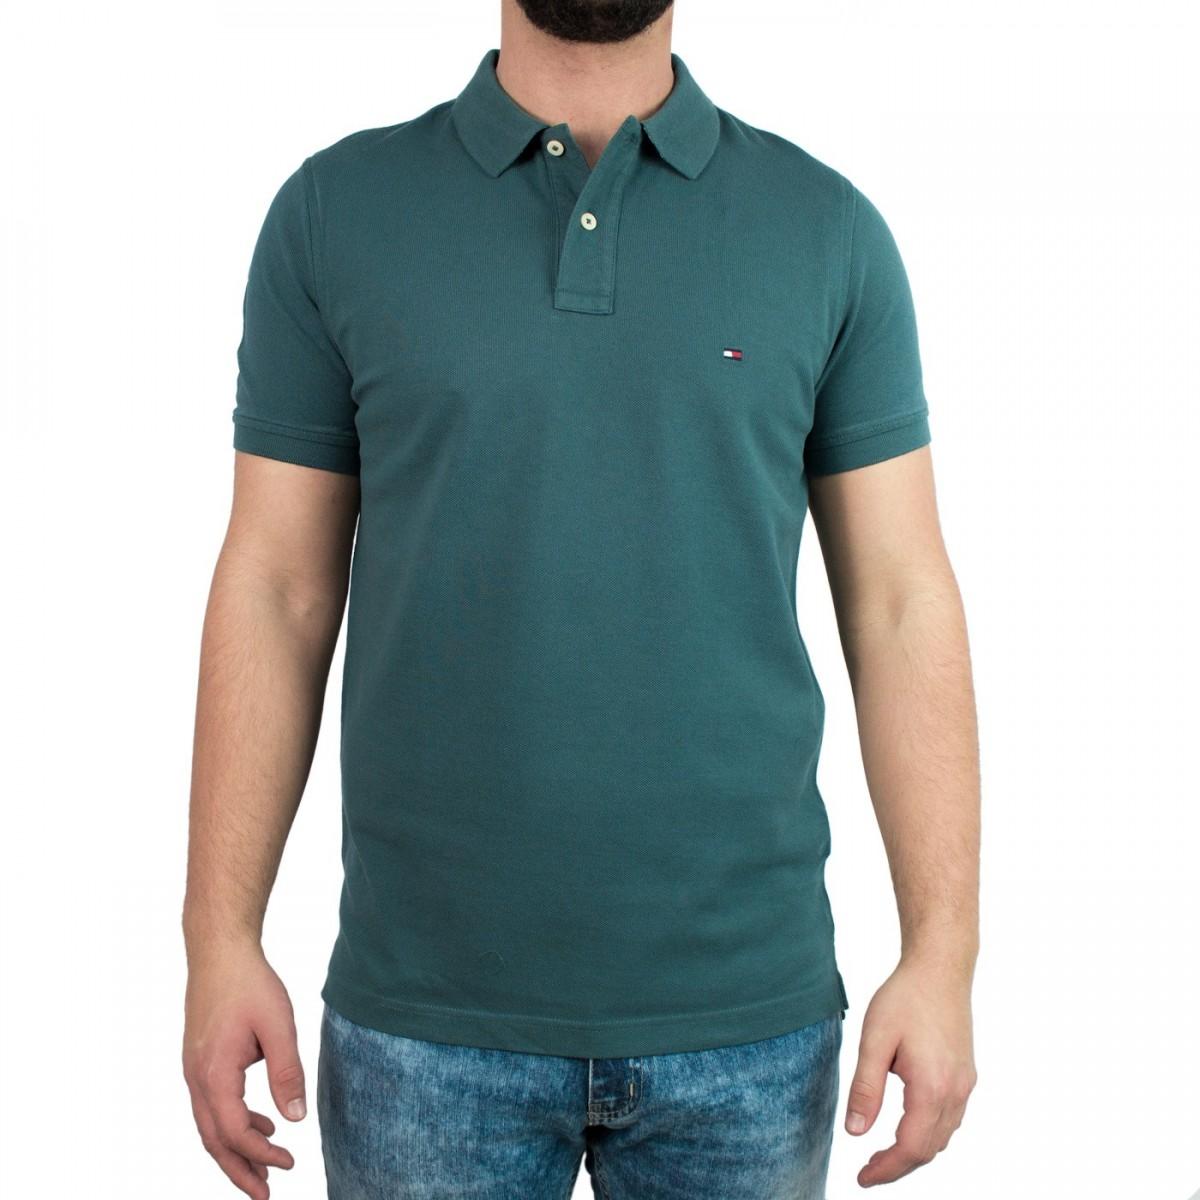 Bizz Store - Camisa Polo Masculina Tommy Hilfiger Slim Fit c517949f194d5